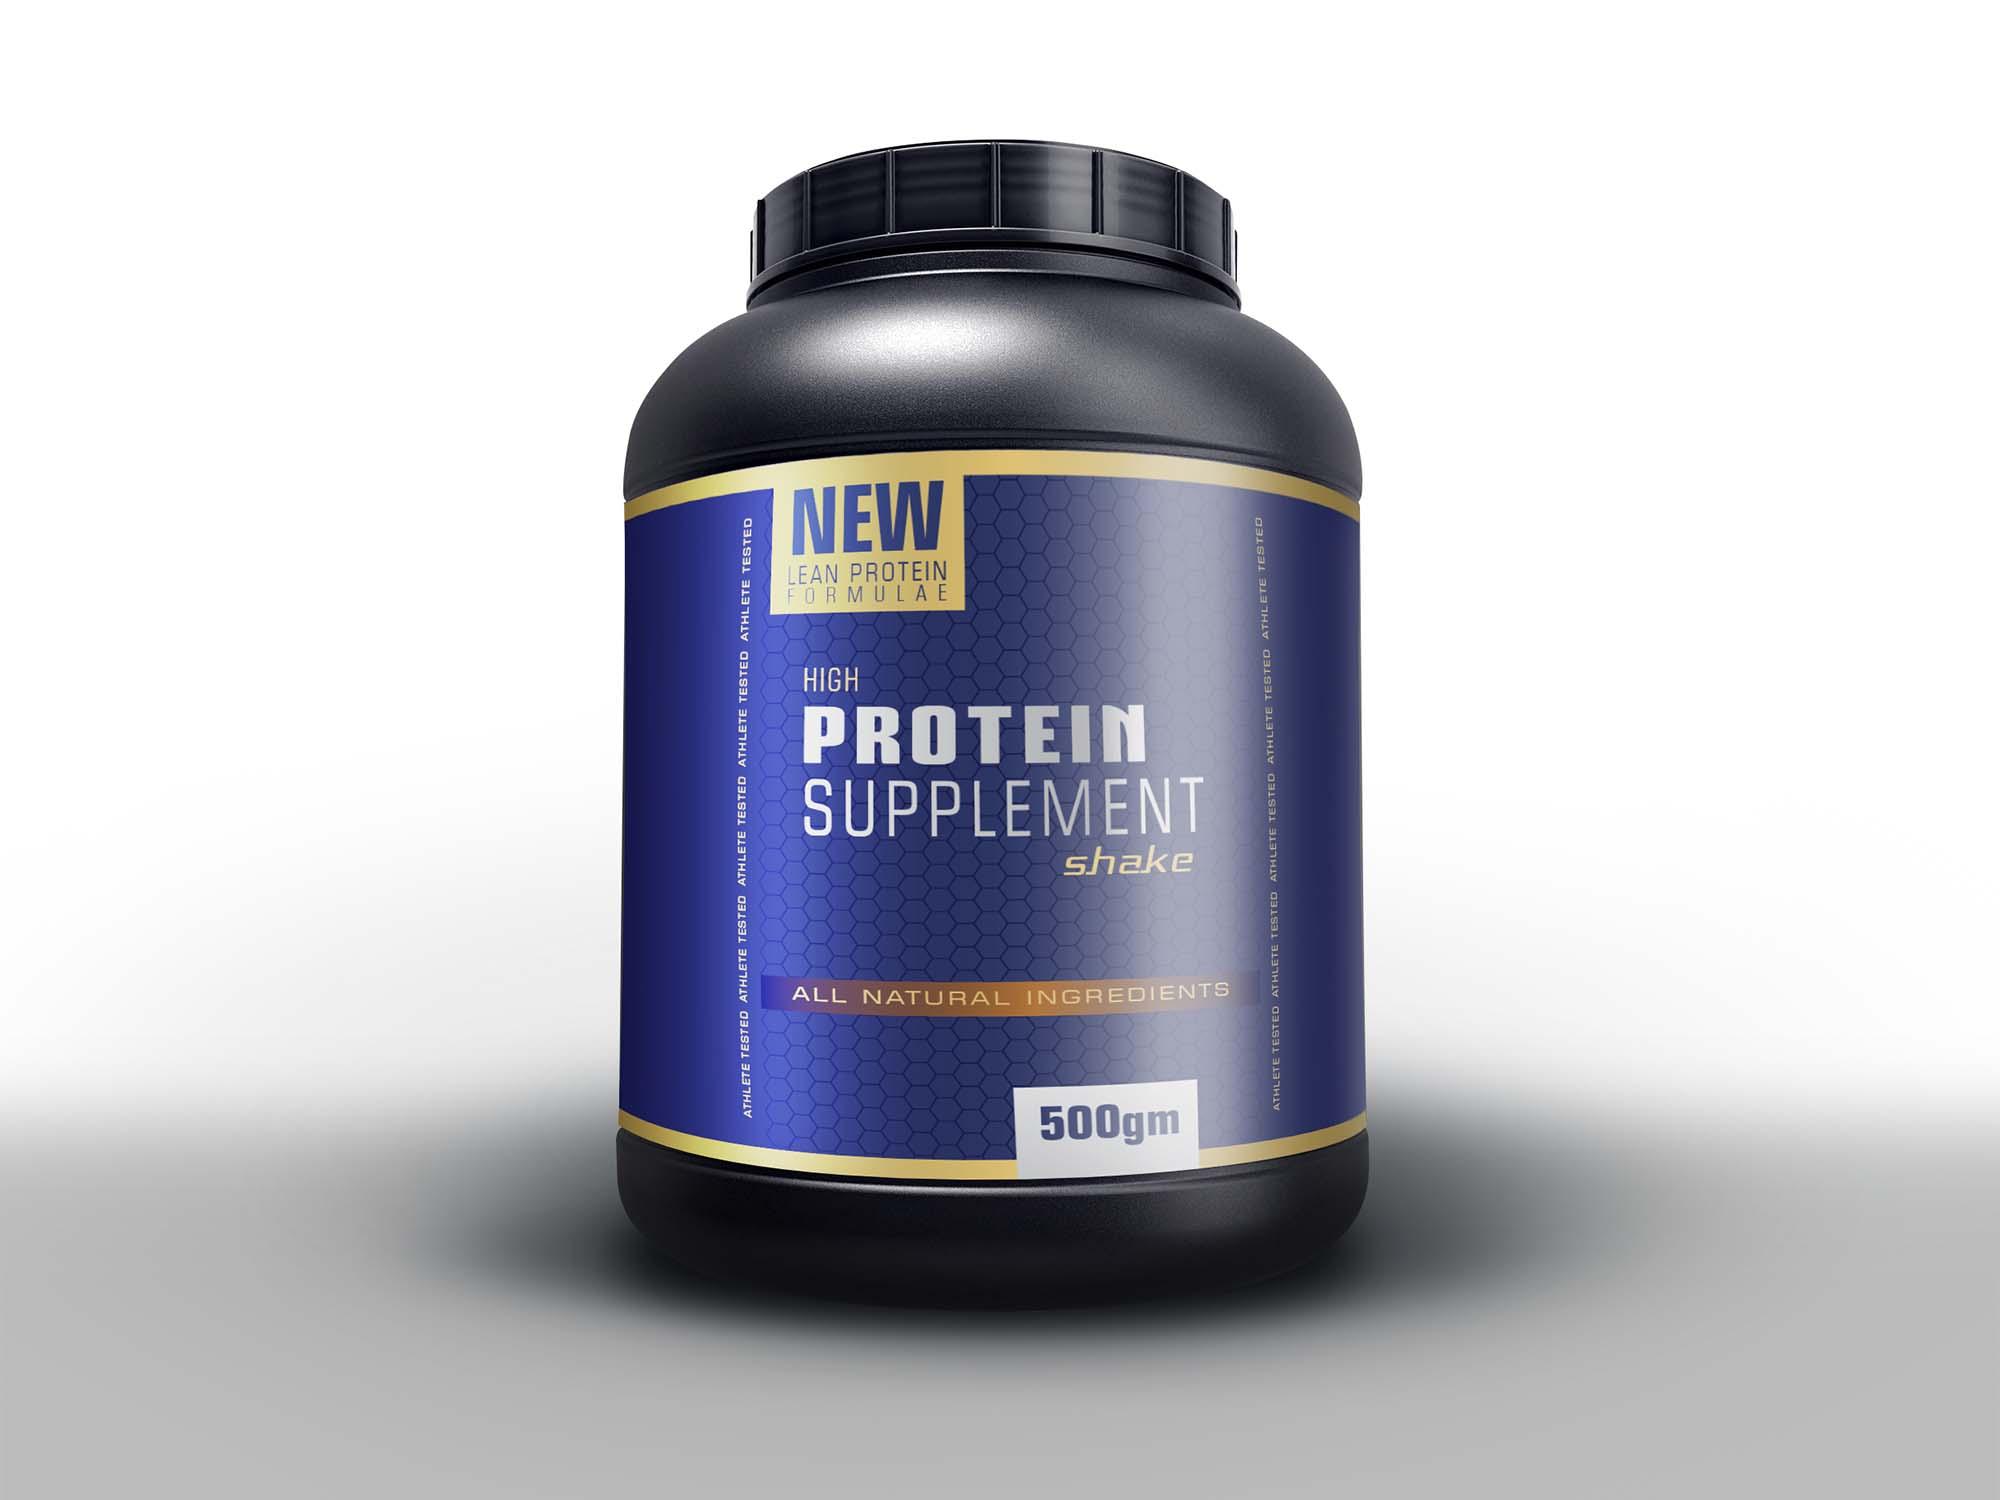 Protein Powder Bottle Mockup